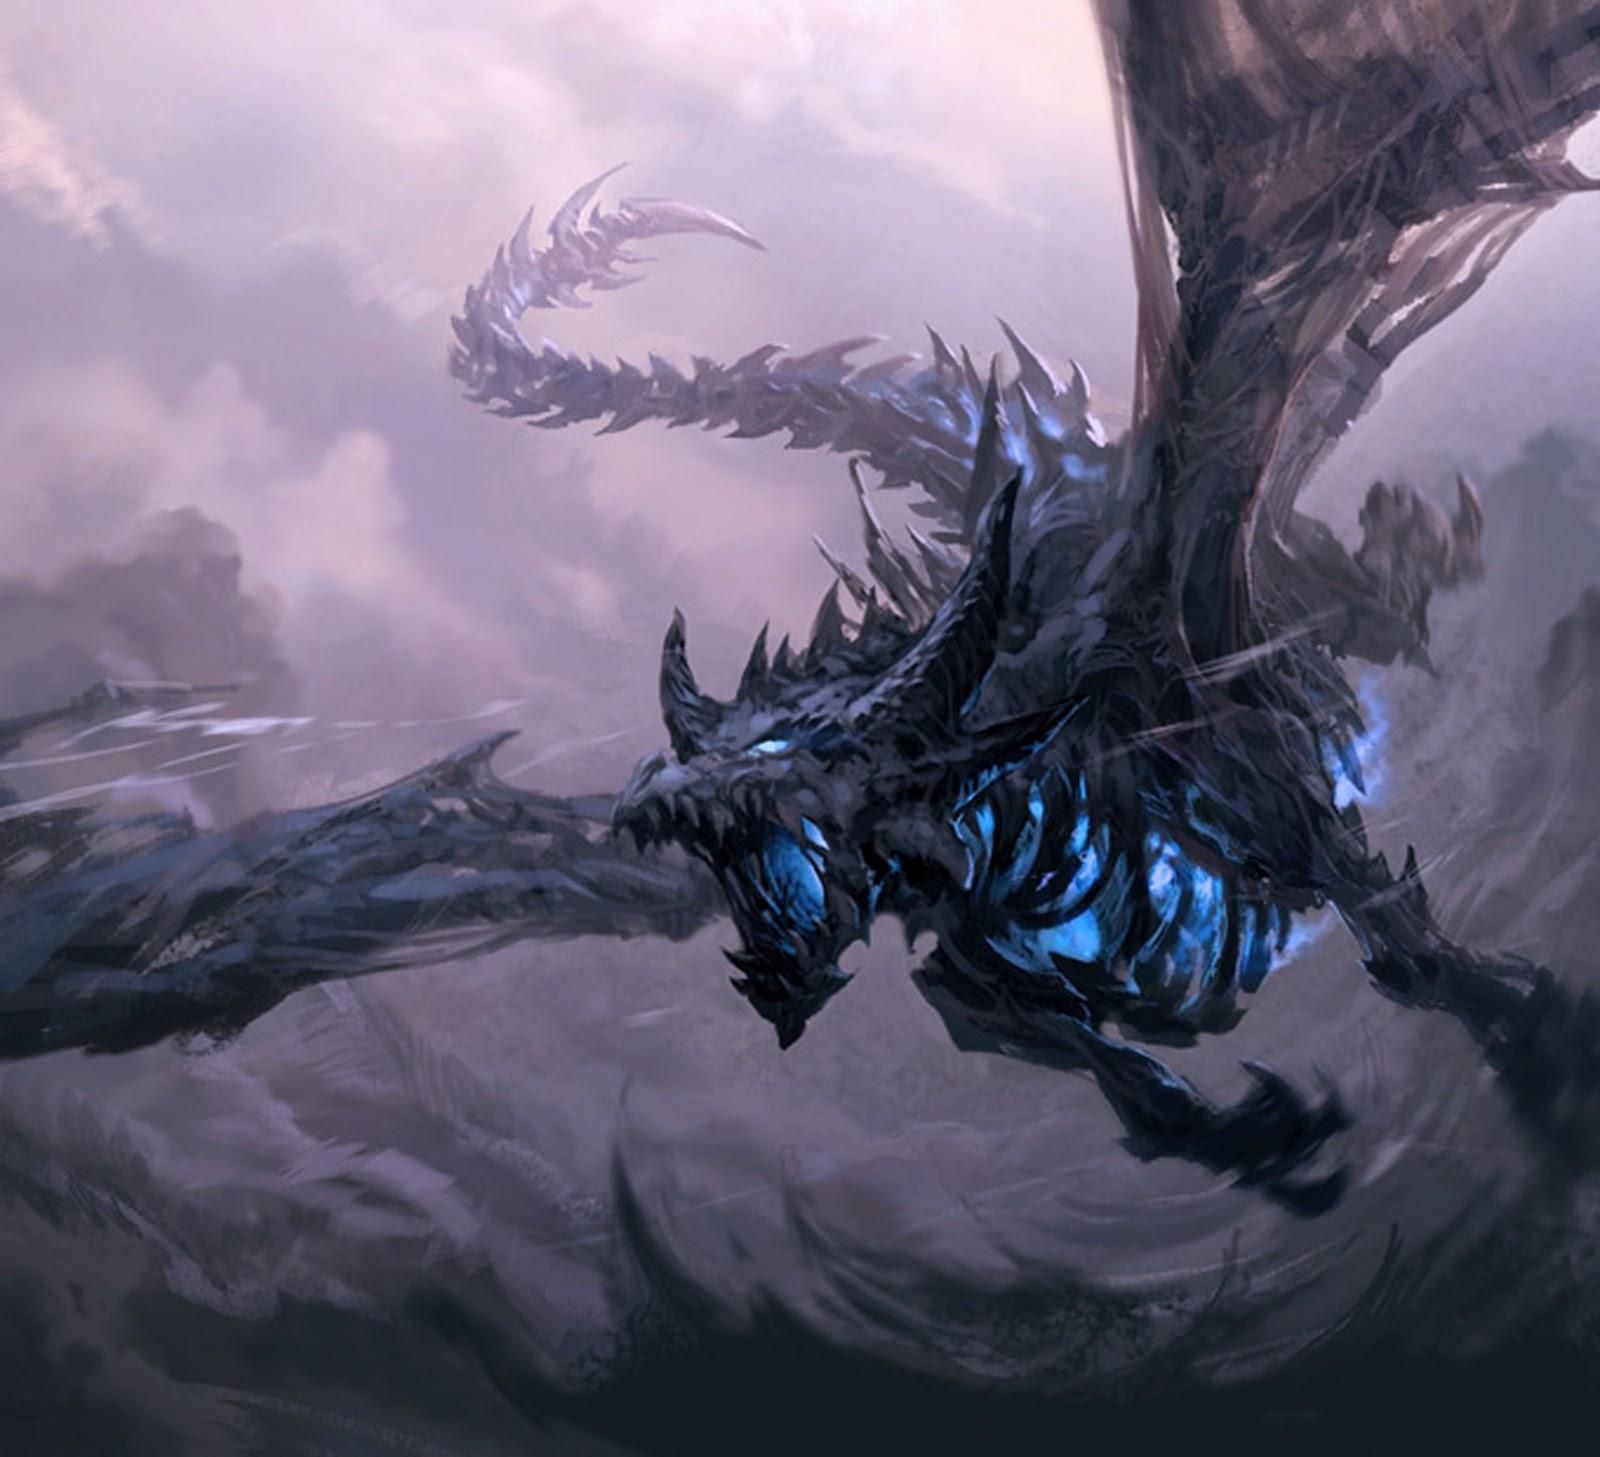 dsng u0026 39 s sci fi megaverse  fantasy dragons concept art gallery